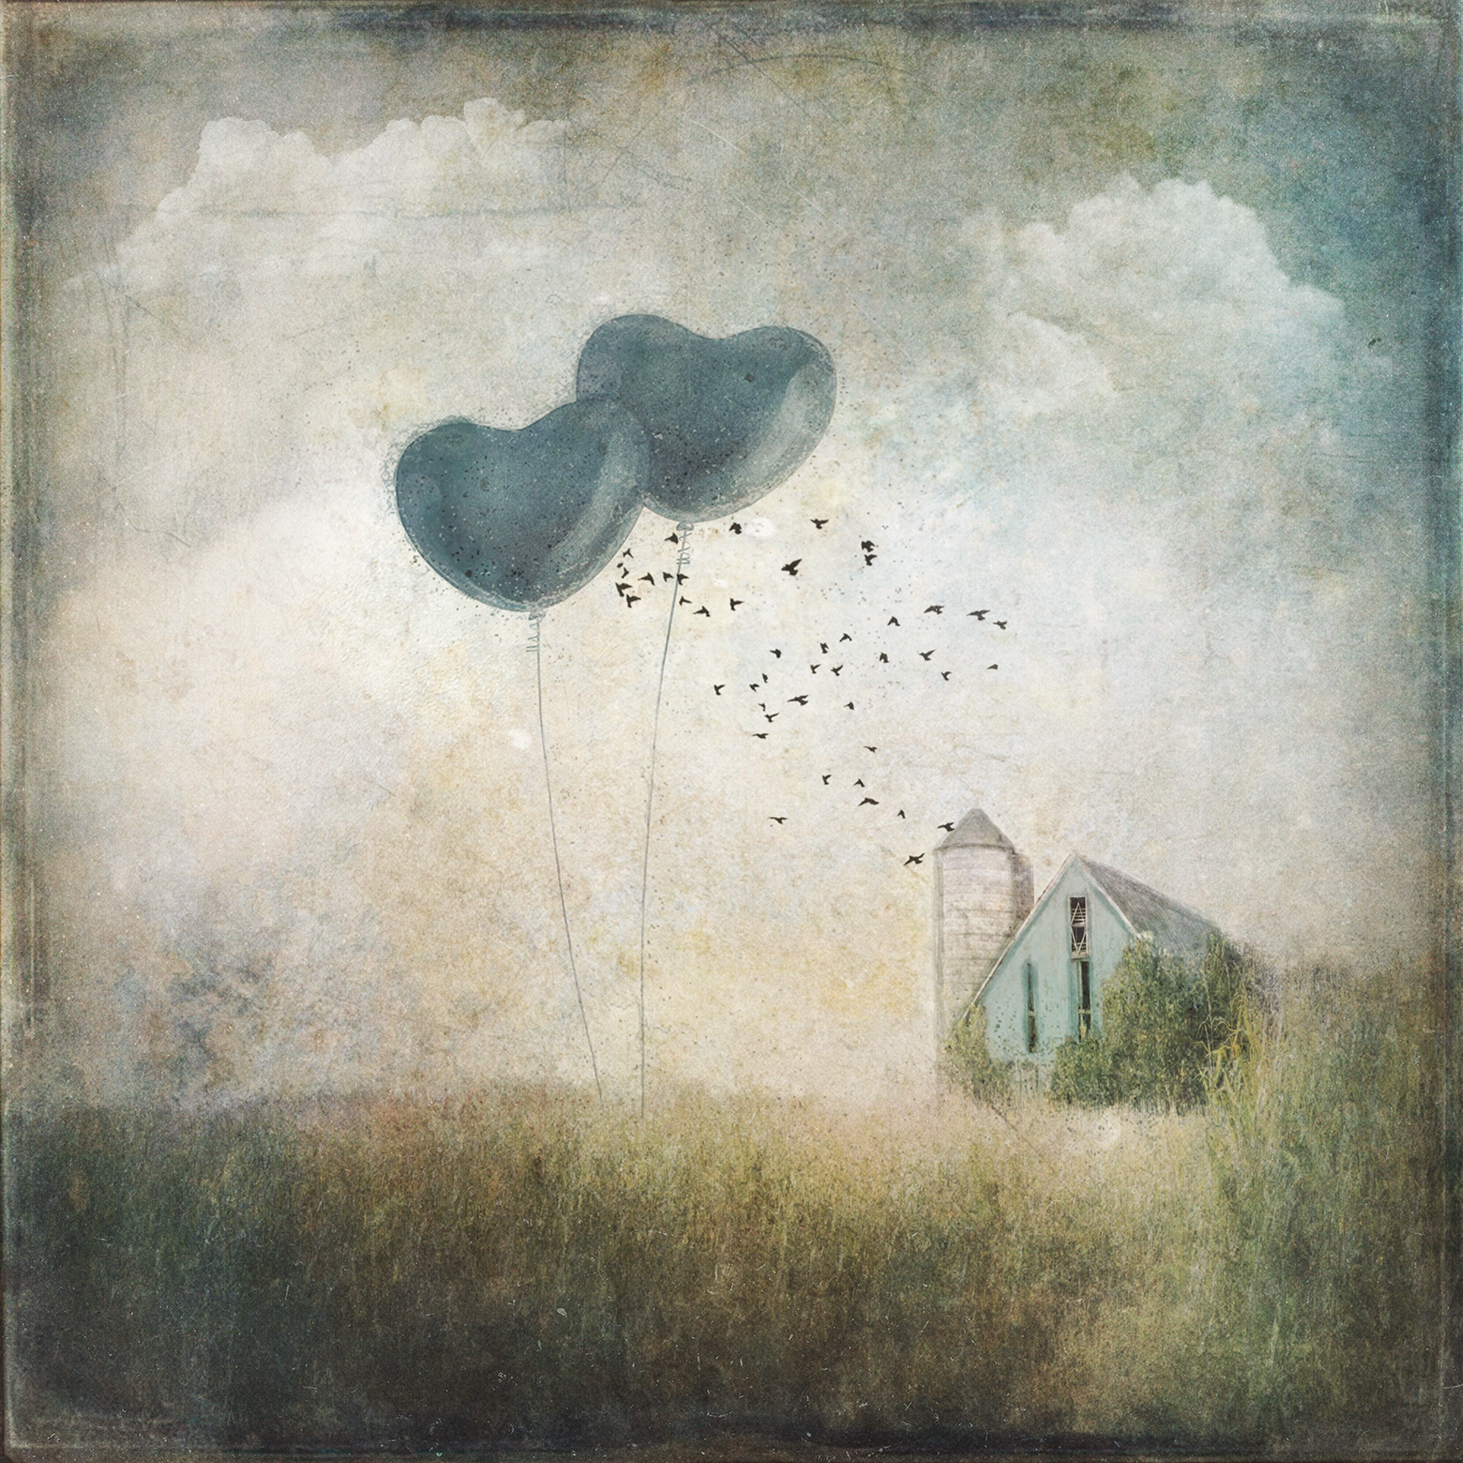 http://hedgehogstudio.com/barnballoons4.875.png